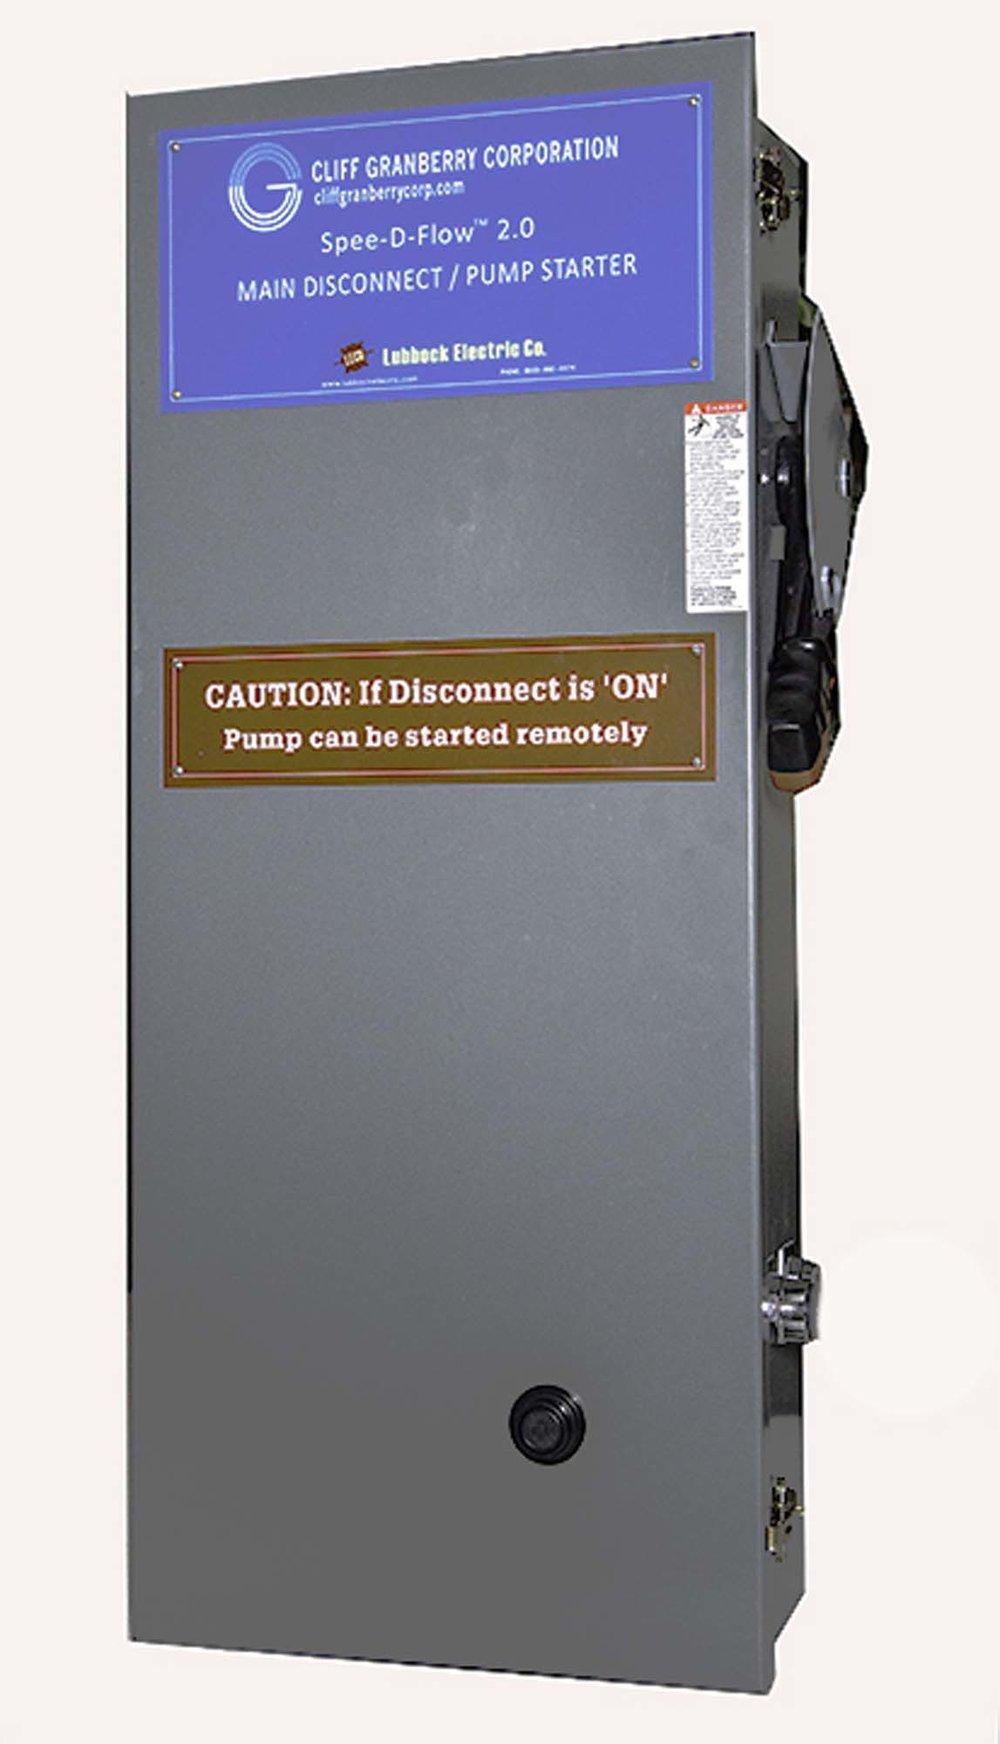 Hydraulic Pump Start Main Control